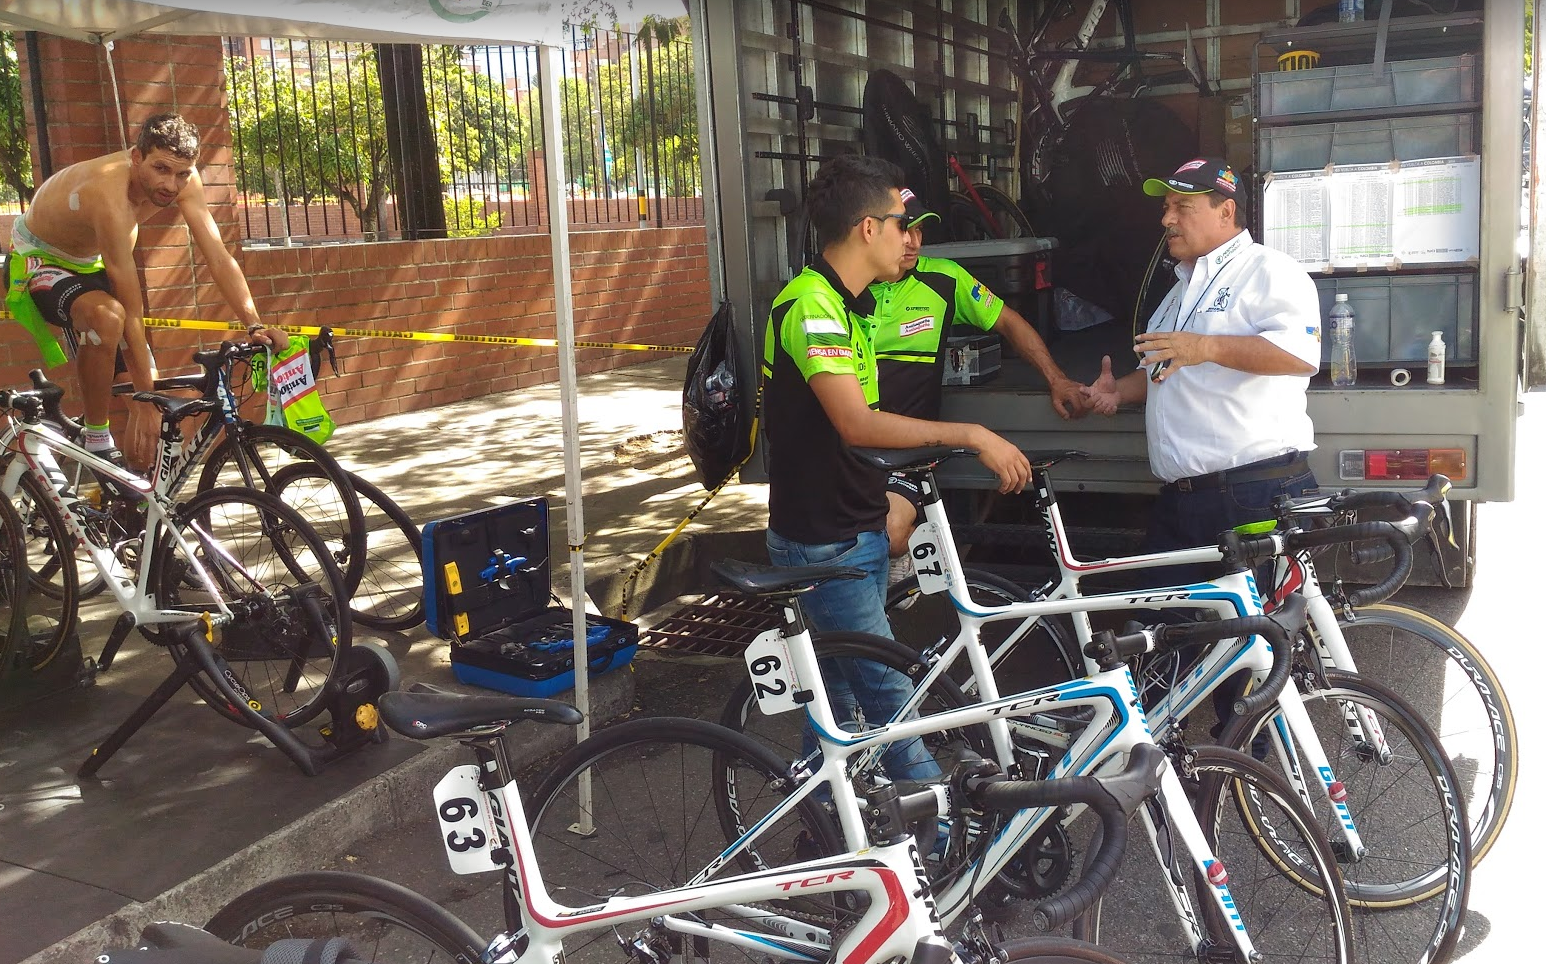 Vuelta a Colombia 2016 - Página 2 Bc124452a5a64e42b32c31dc0113aa09